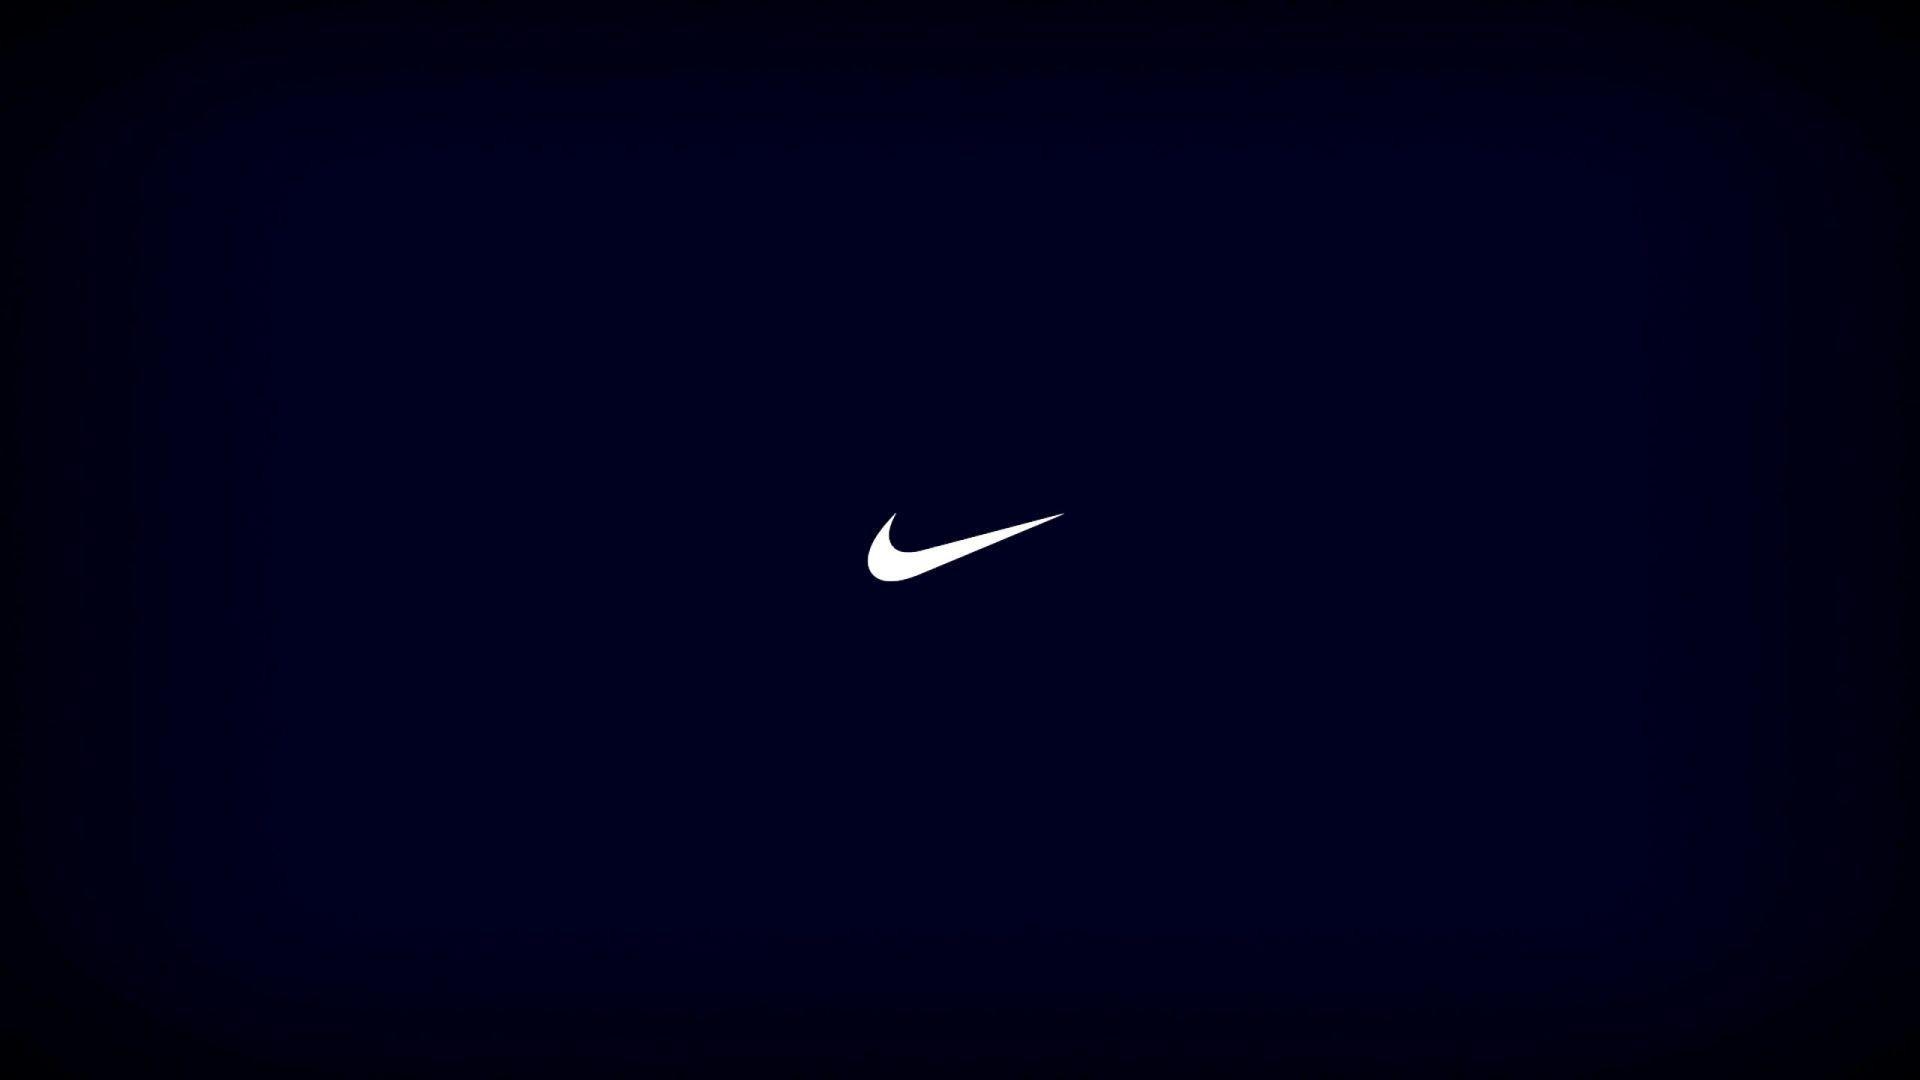 Nike Swoosh Wallpapers: Nike Logo Wallpapers (56+ Images